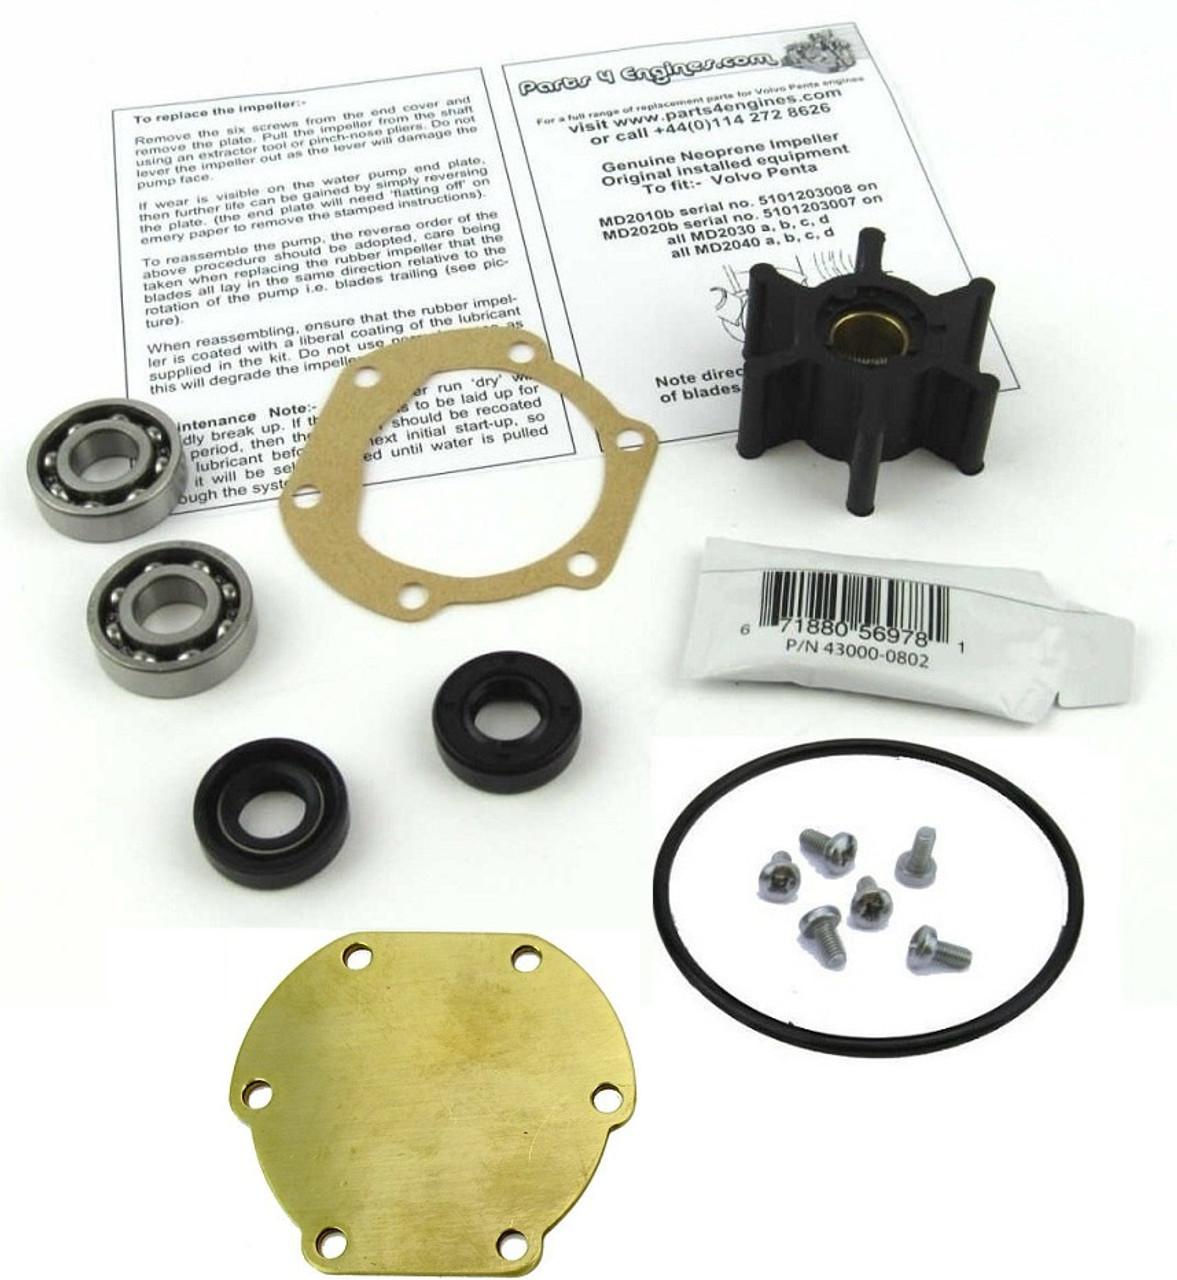 (Late) Volvo Penta MD2010 raw water pump rebuild kit - Parts4engines.com